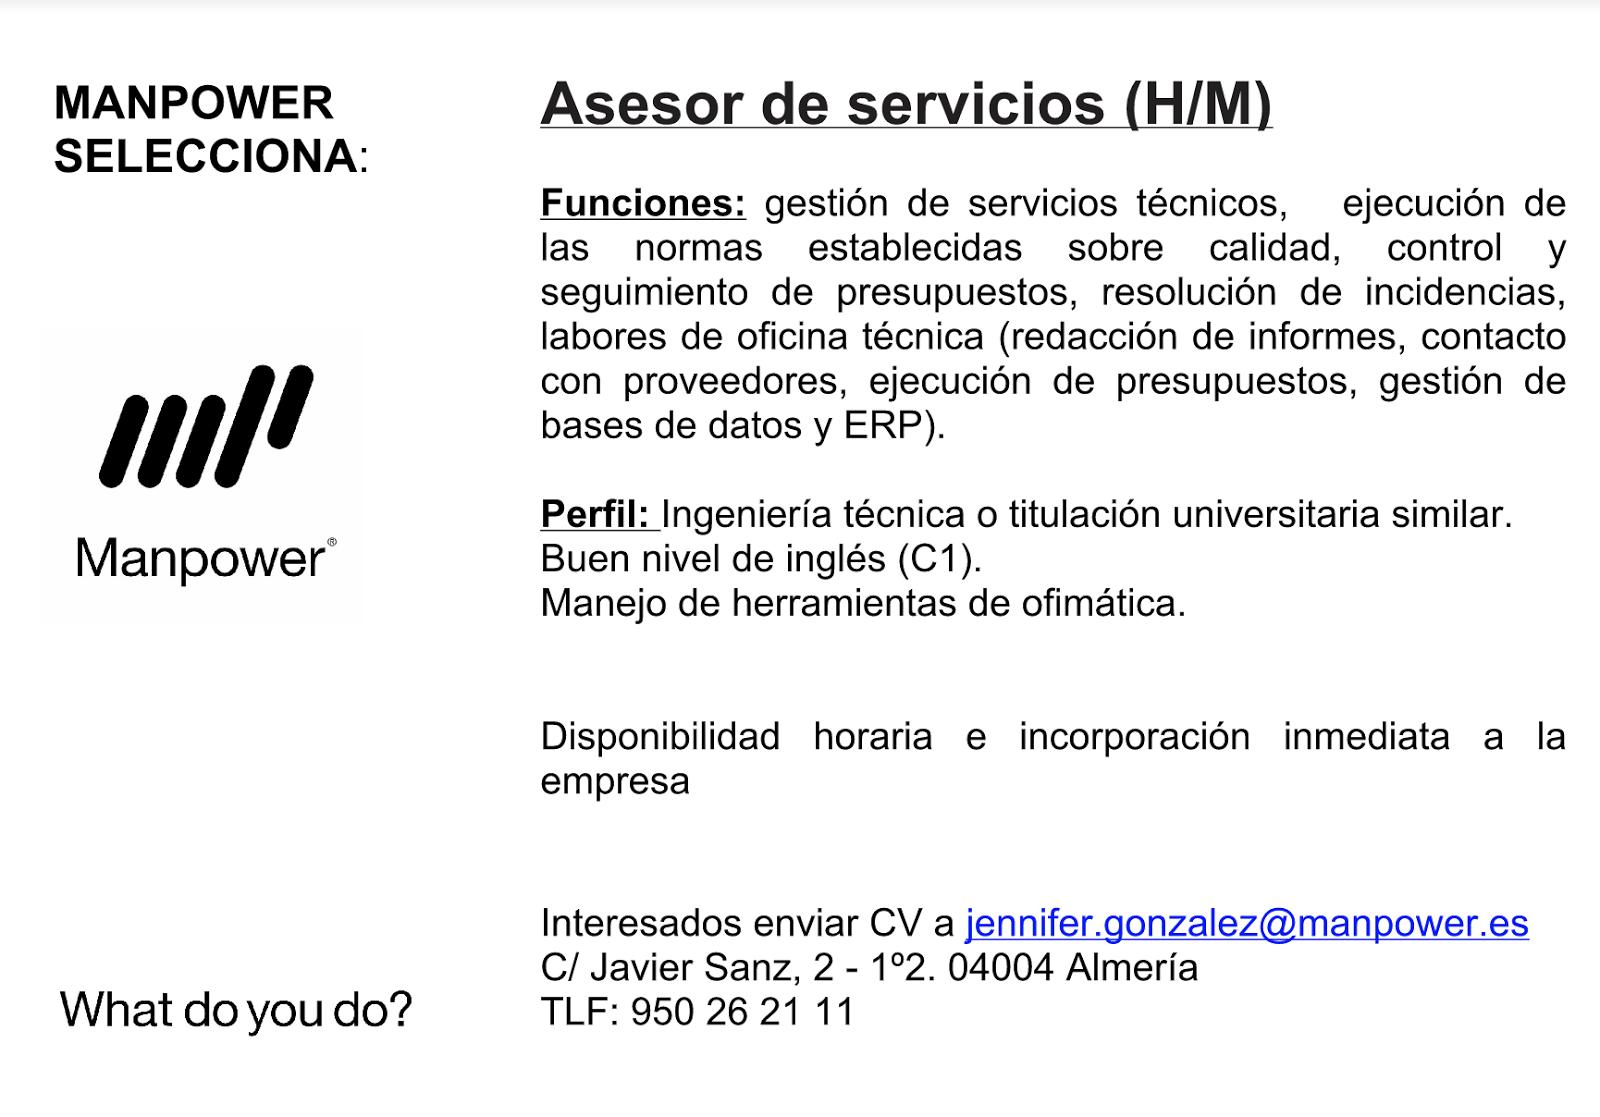 Ofertas de Empleo en España: noviembre 2017